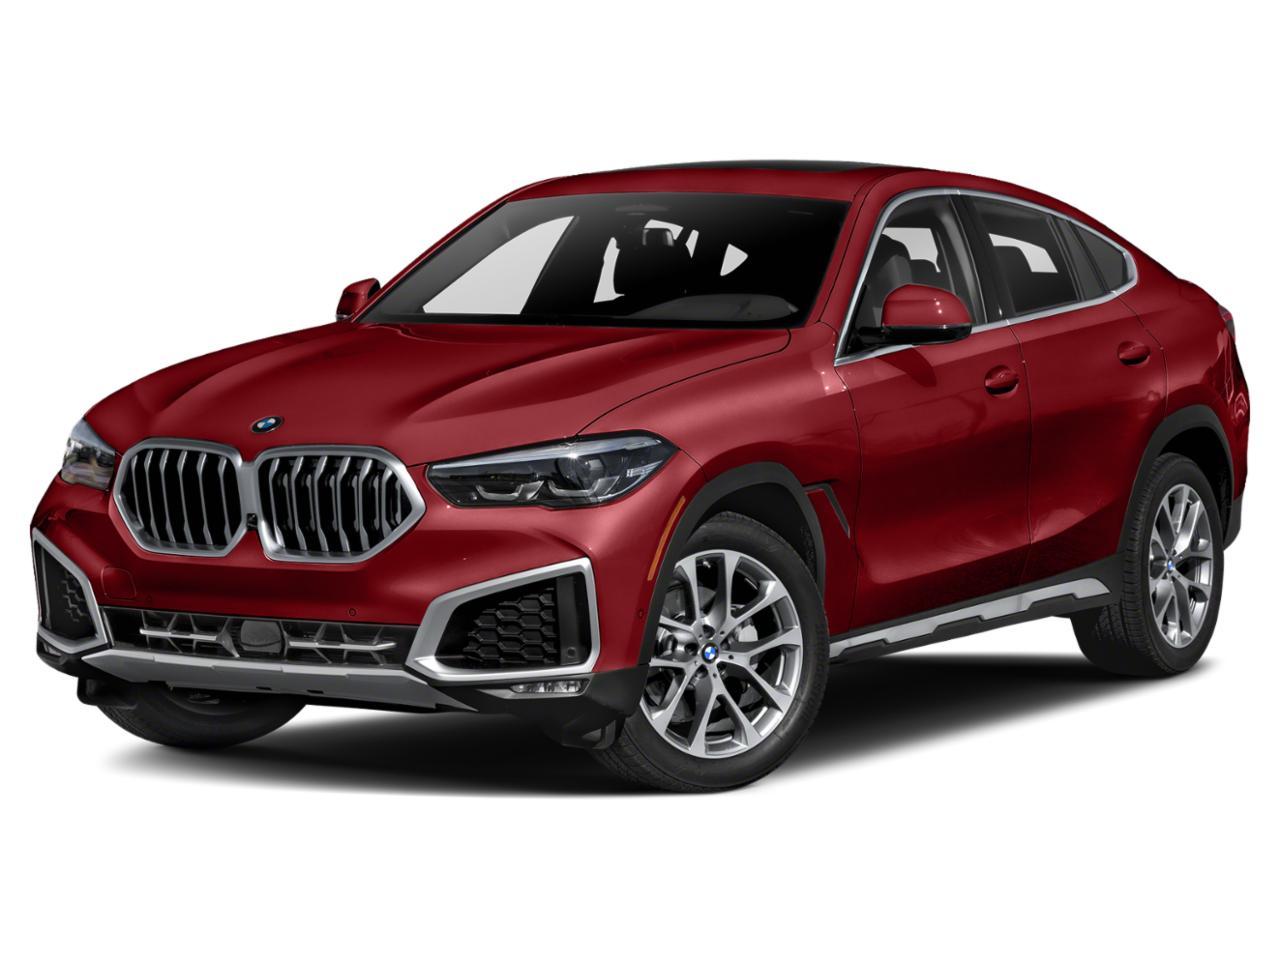 New 2020 BMW X6 xDrive40i Flamenco Red Metallic: Suv for ...